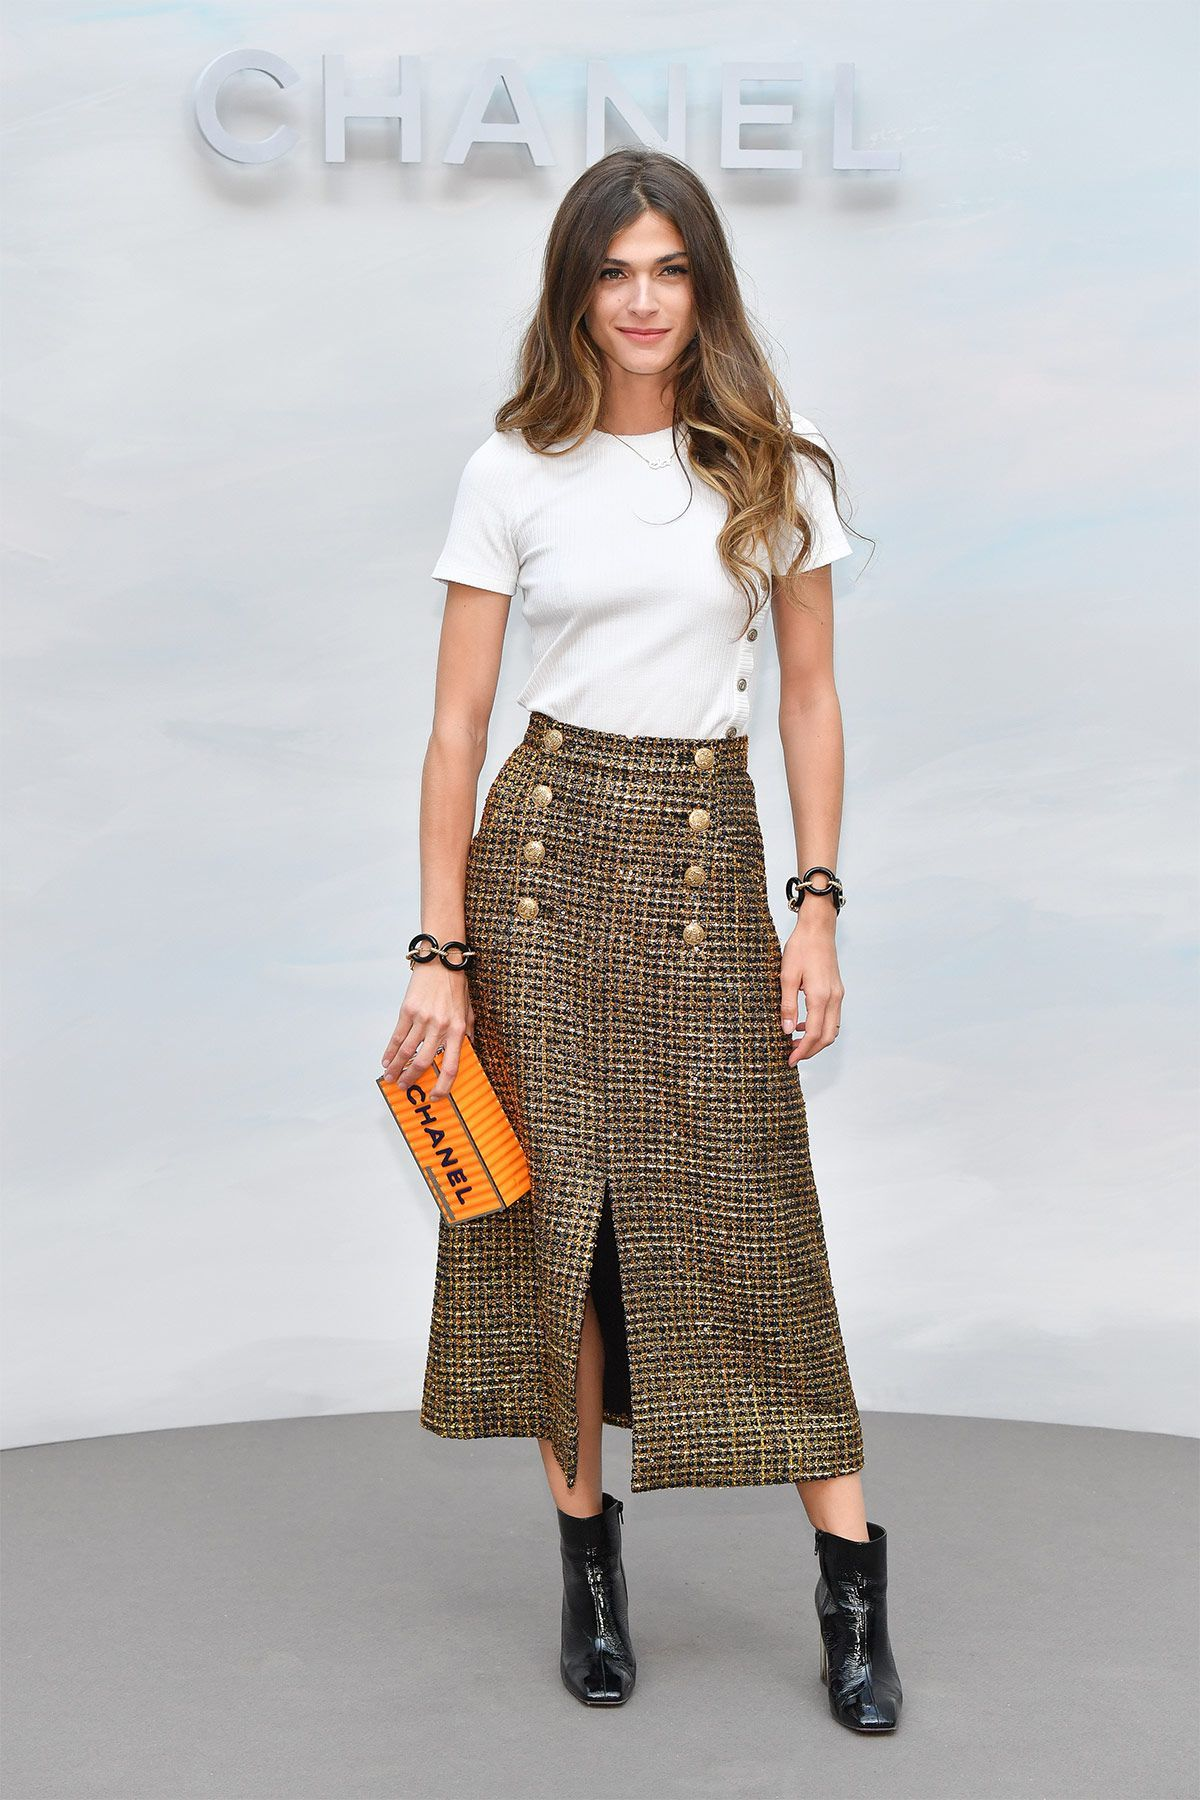 Elisa Sednaoui: Penélope Cruz, a la francesa en el 'front row' de Chanel- ElleSpain